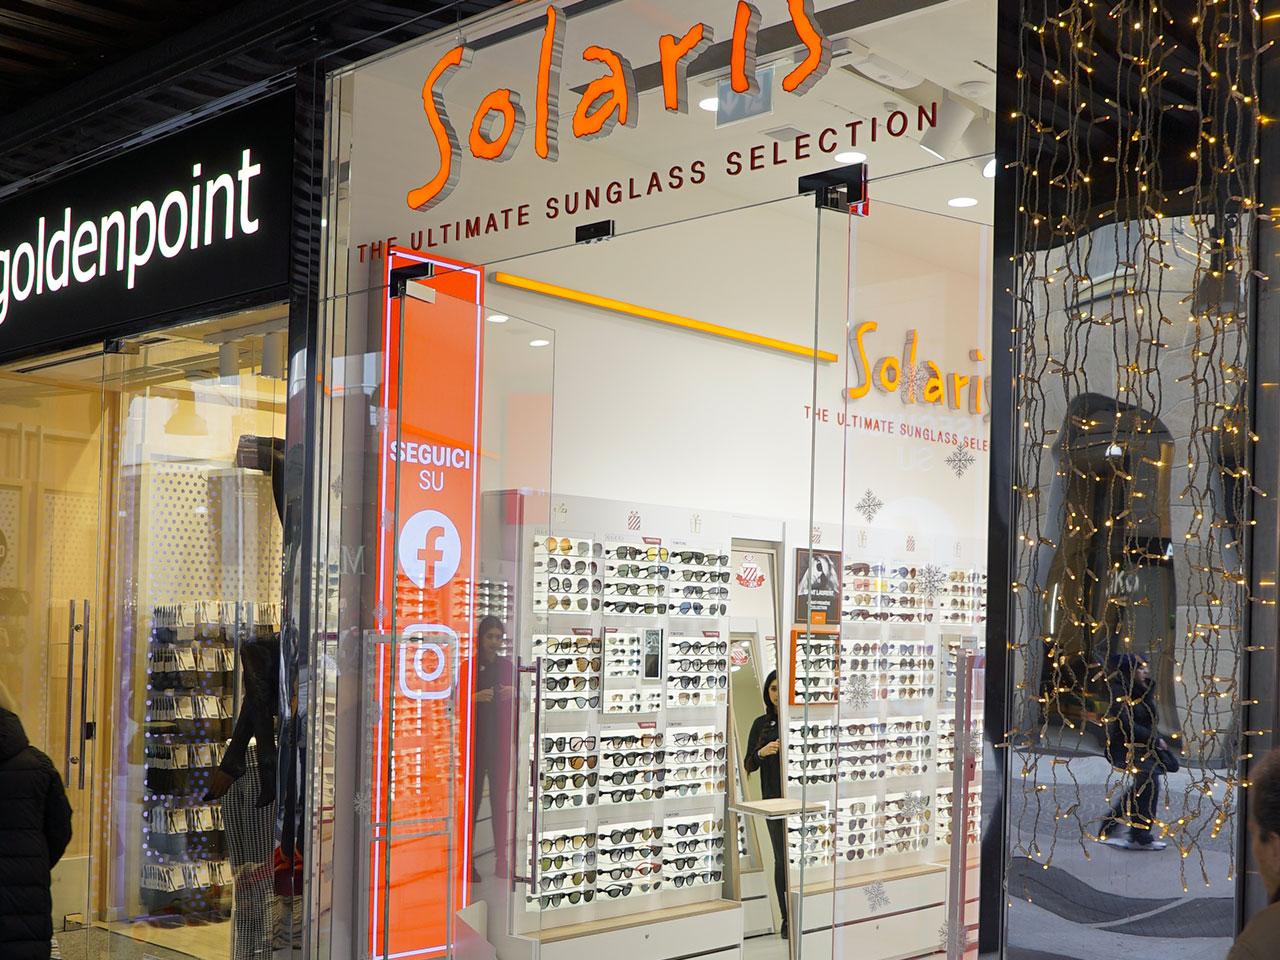 Solaris-ledwall-indoor-schermi-da-interni-fondo-store-retro-cassa-1280x960-3